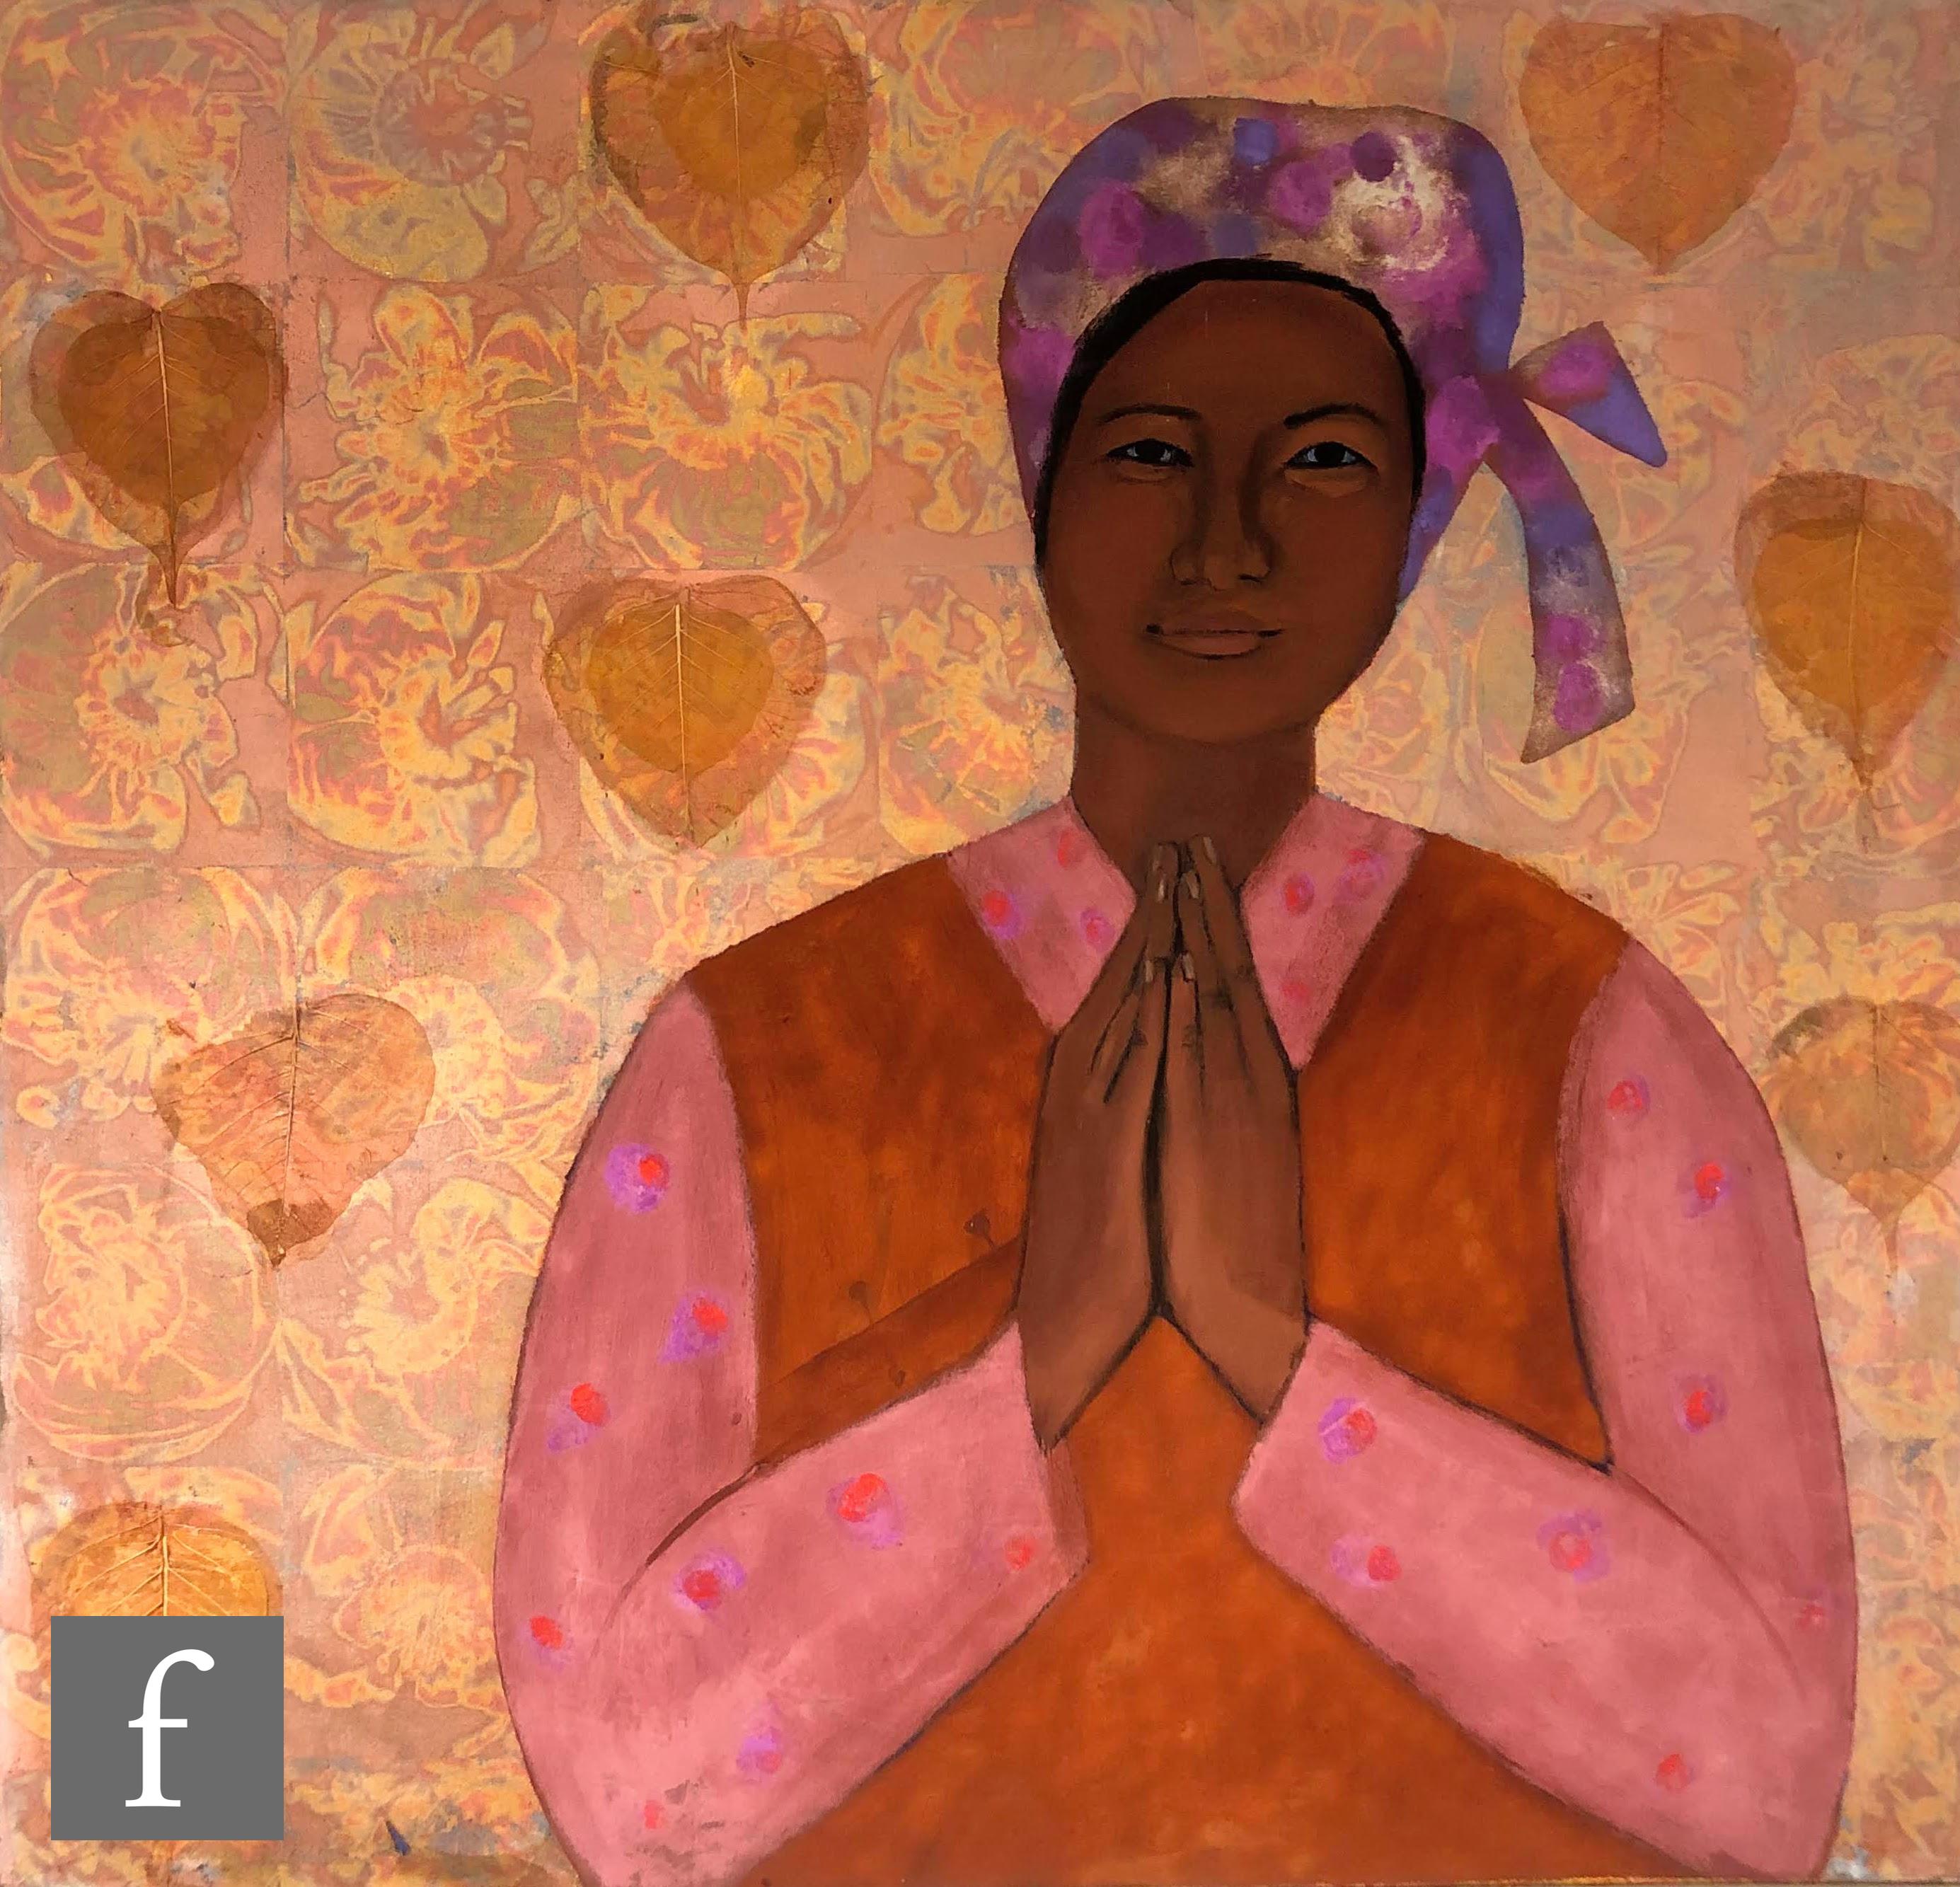 SUSAN JAYNE HOCKING (B. 1962) - Namaste, oil, pigment and metal leaves on canvas, signed verso,